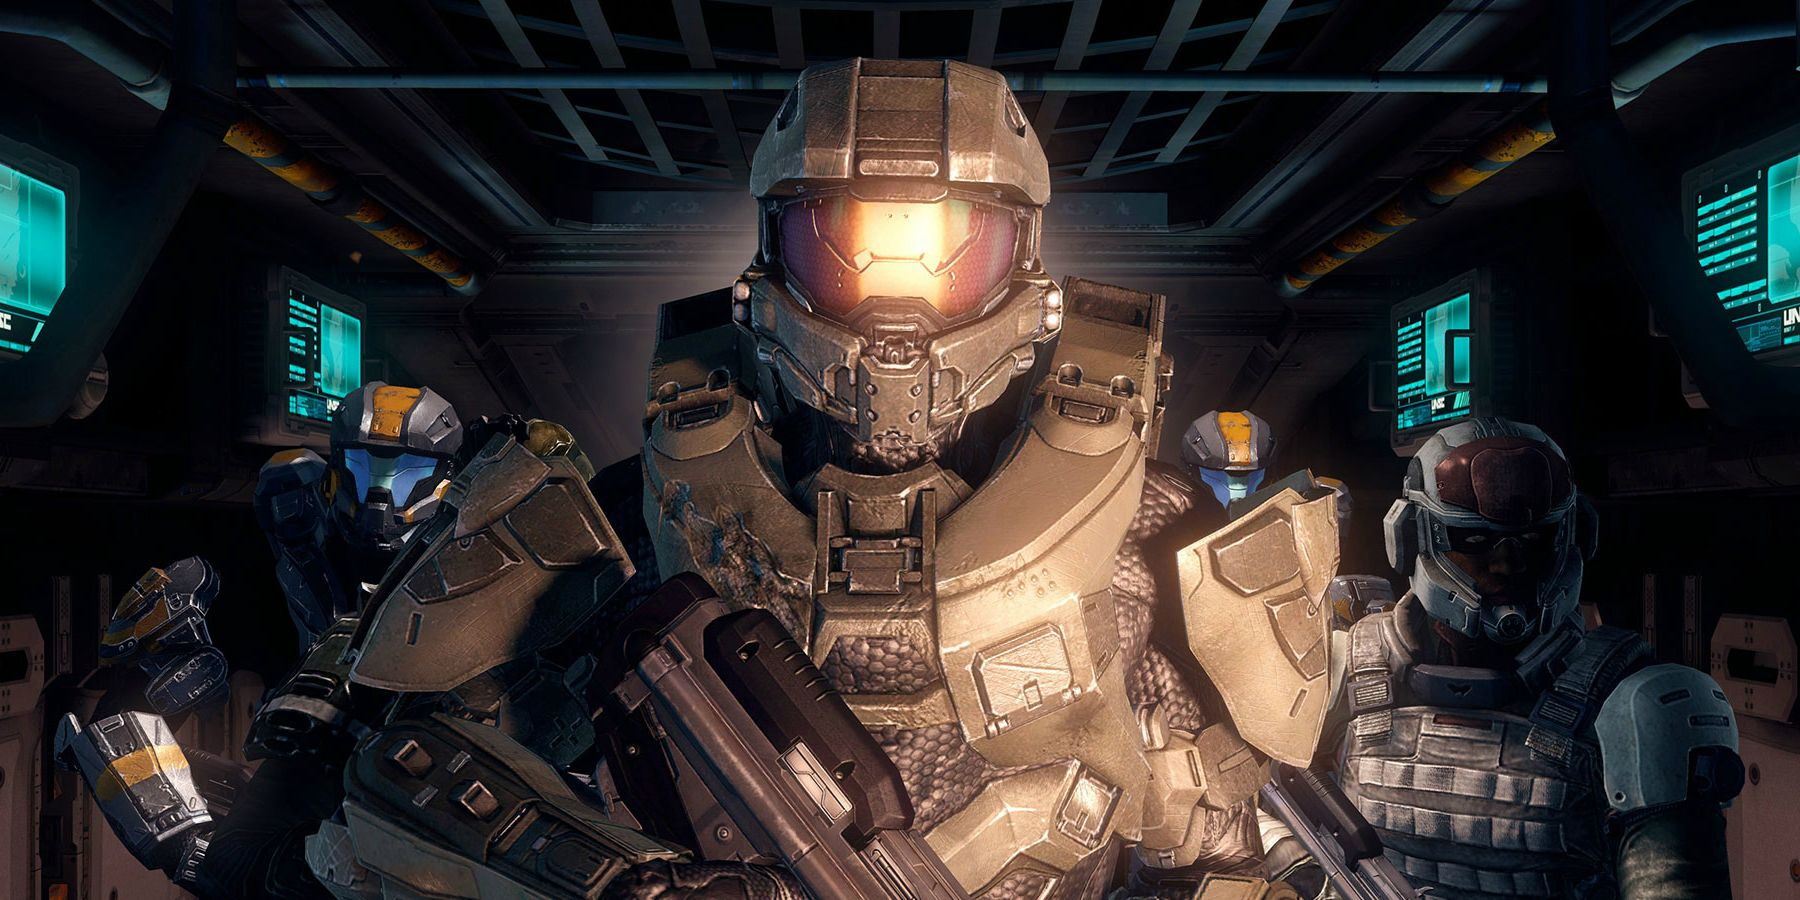 Halo Infinite Has 4 Player Splitscreen Reach Style